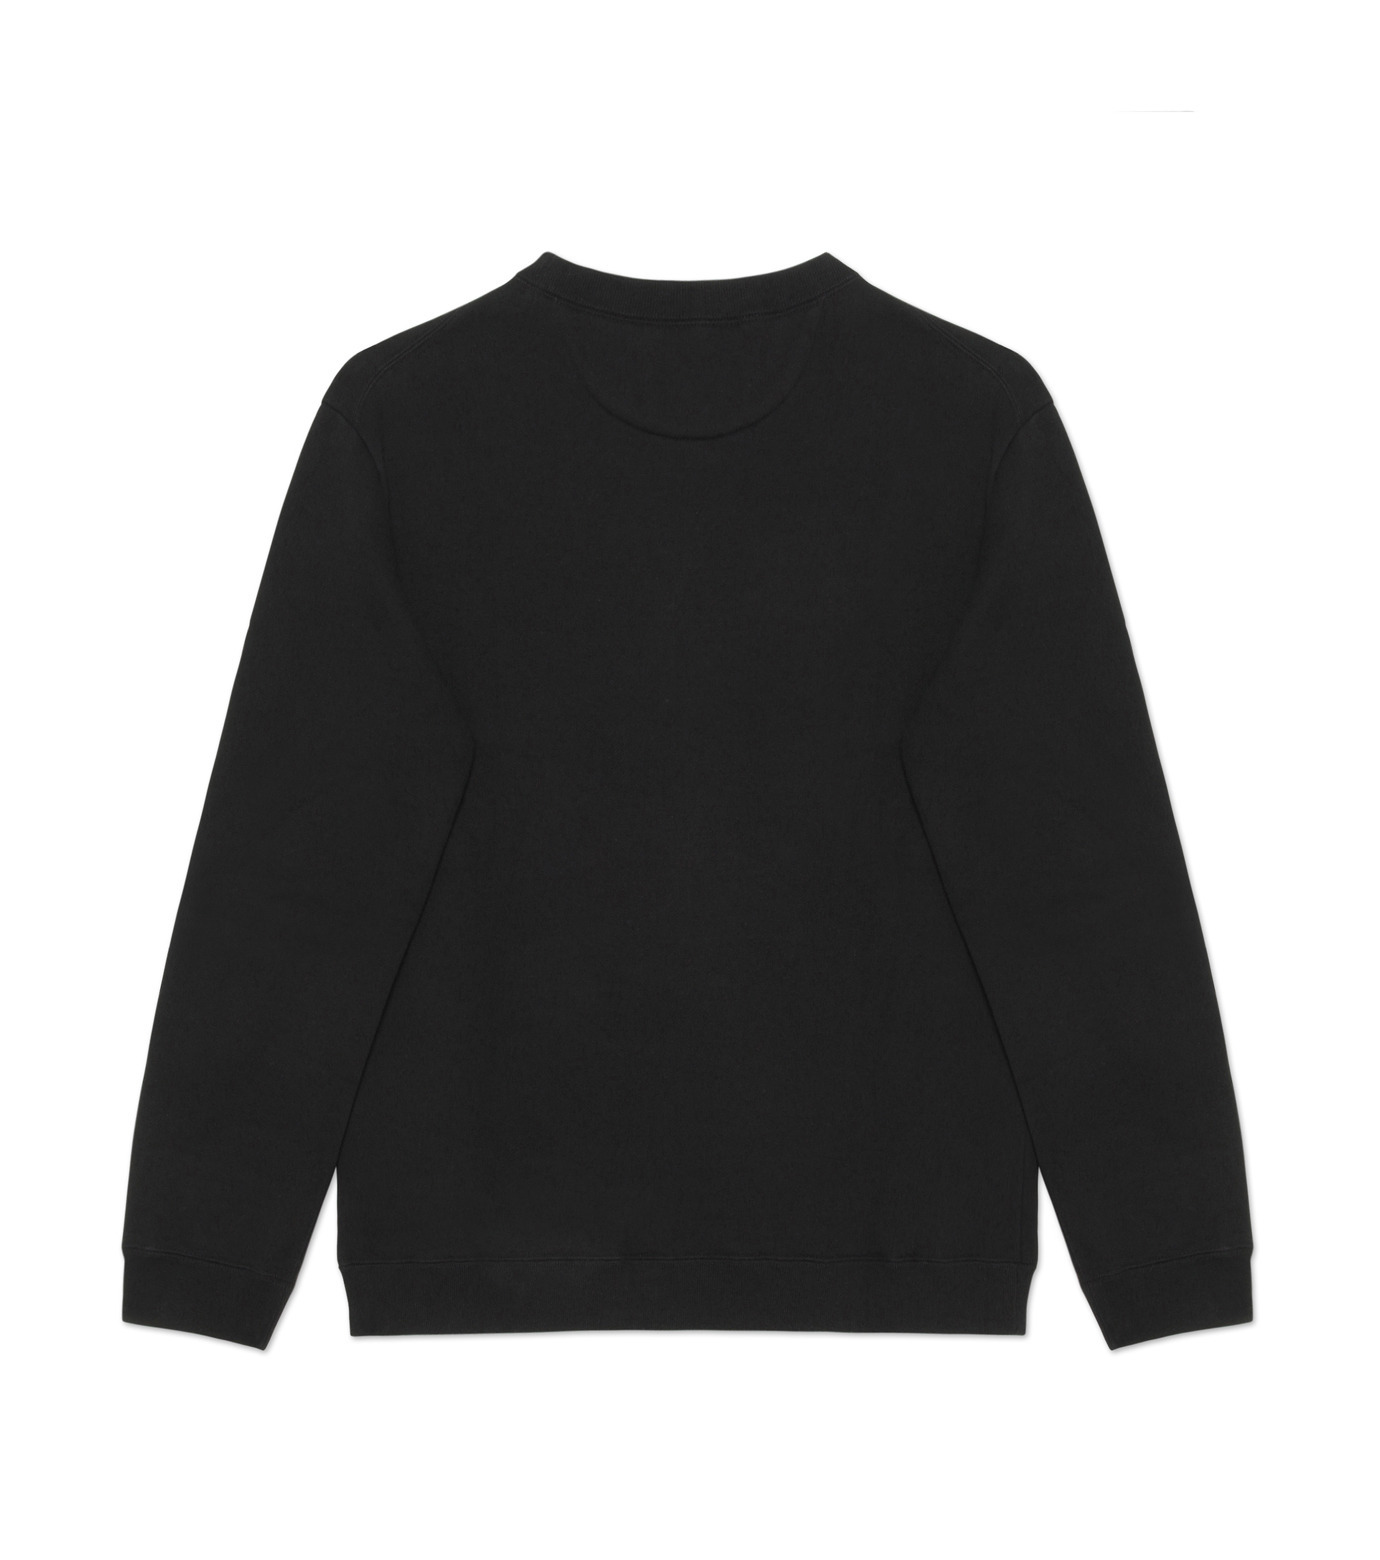 HL HEDDIE LOVU(エイチエル・エディールーヴ)のTHINGS pt SWEATS-BLACK(カットソー/cut and sewn)-18S92005-13 拡大詳細画像5